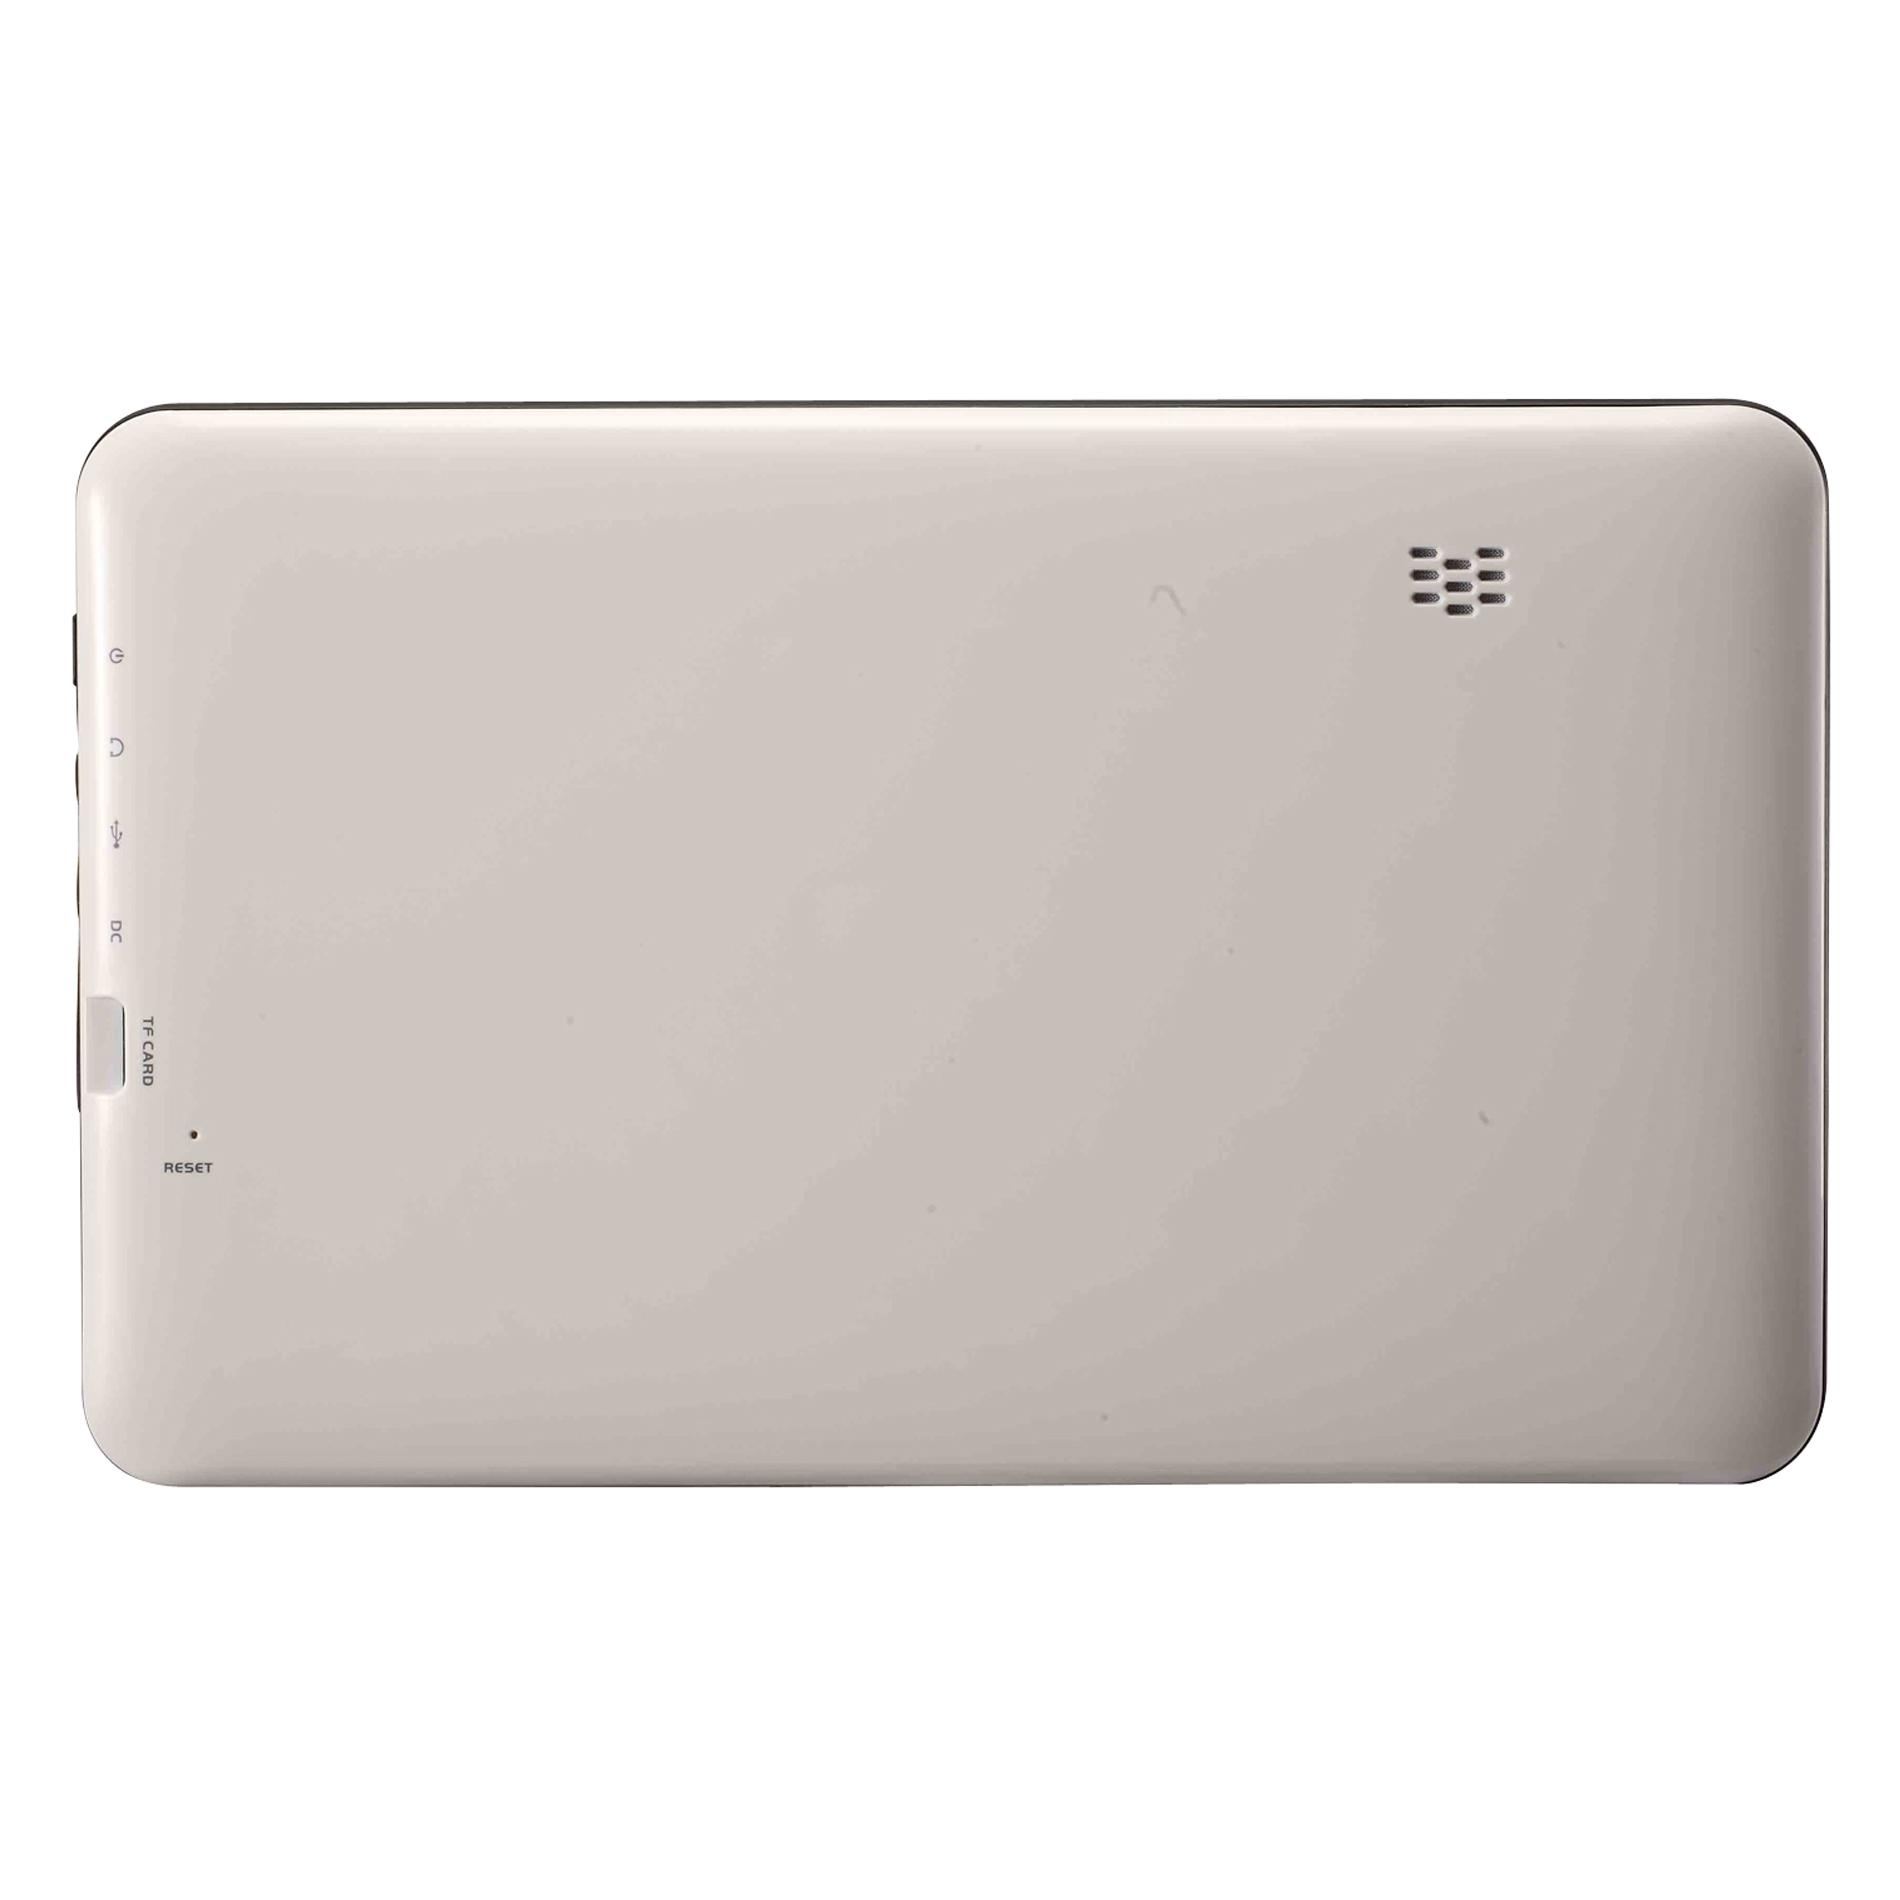 "D.Age 9"" Internet Tablet w/ Android Ice Cream Sandwich OS - DA-988"